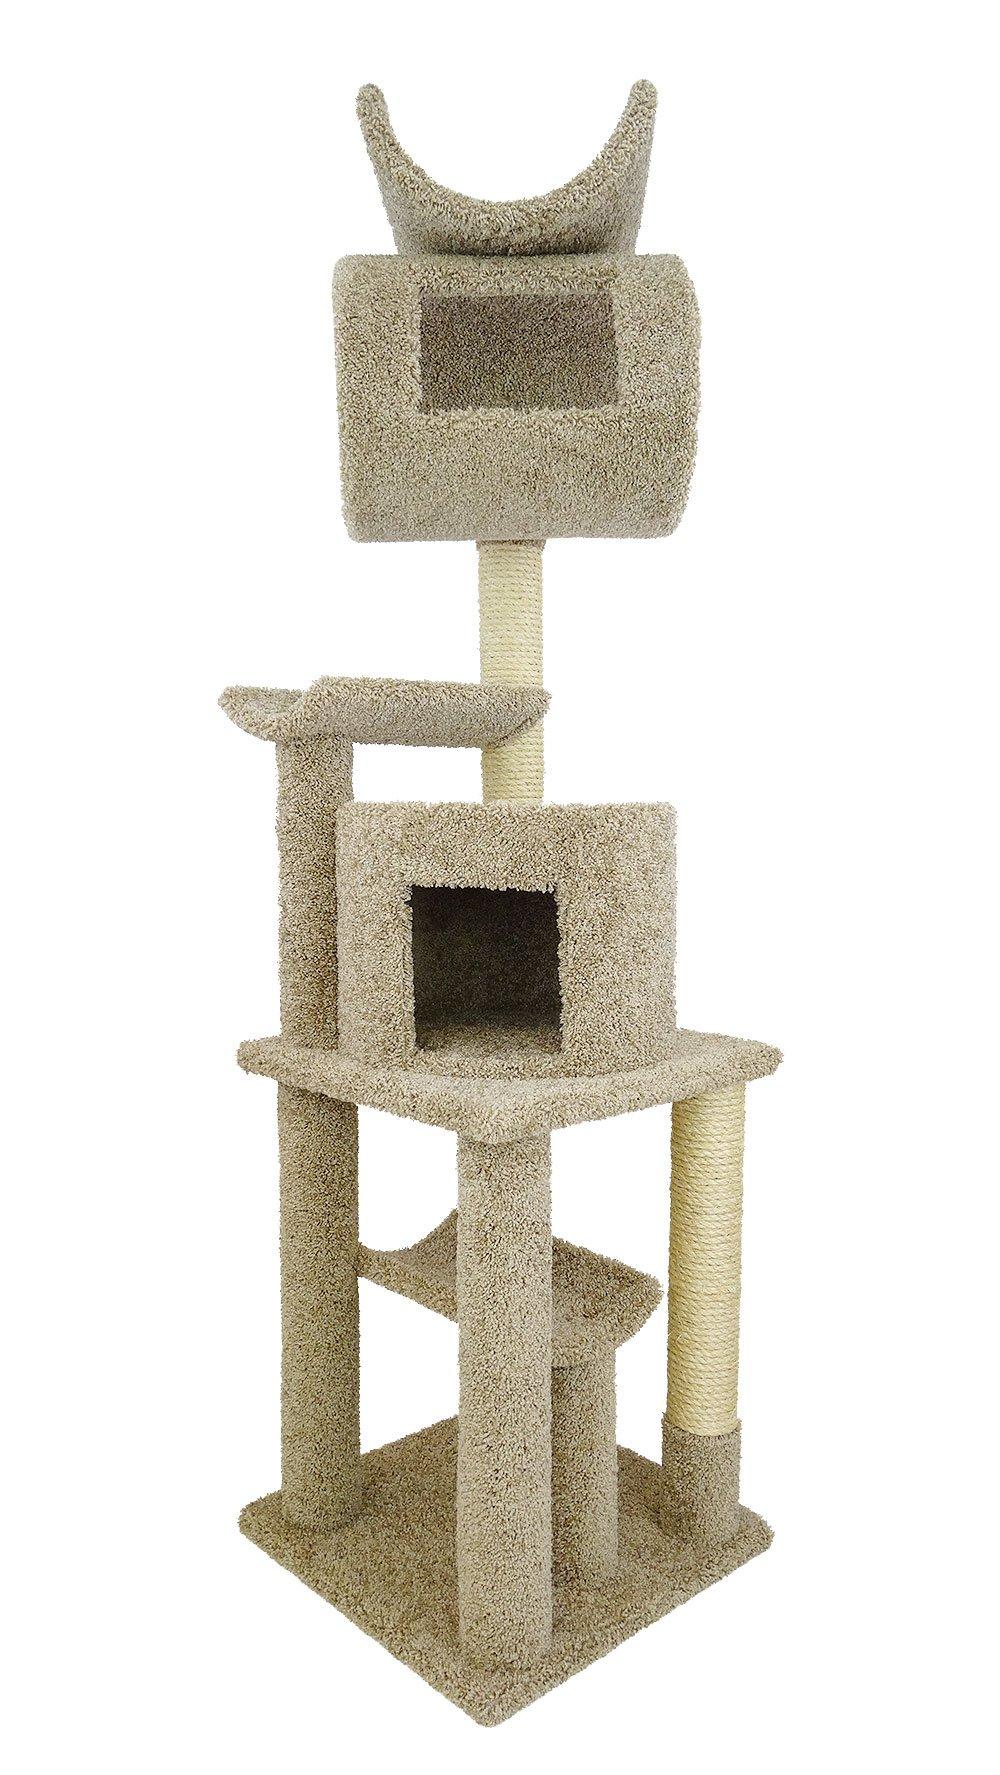 New Cat Condos Premier Cat Playstation, 72-Inch, Beige